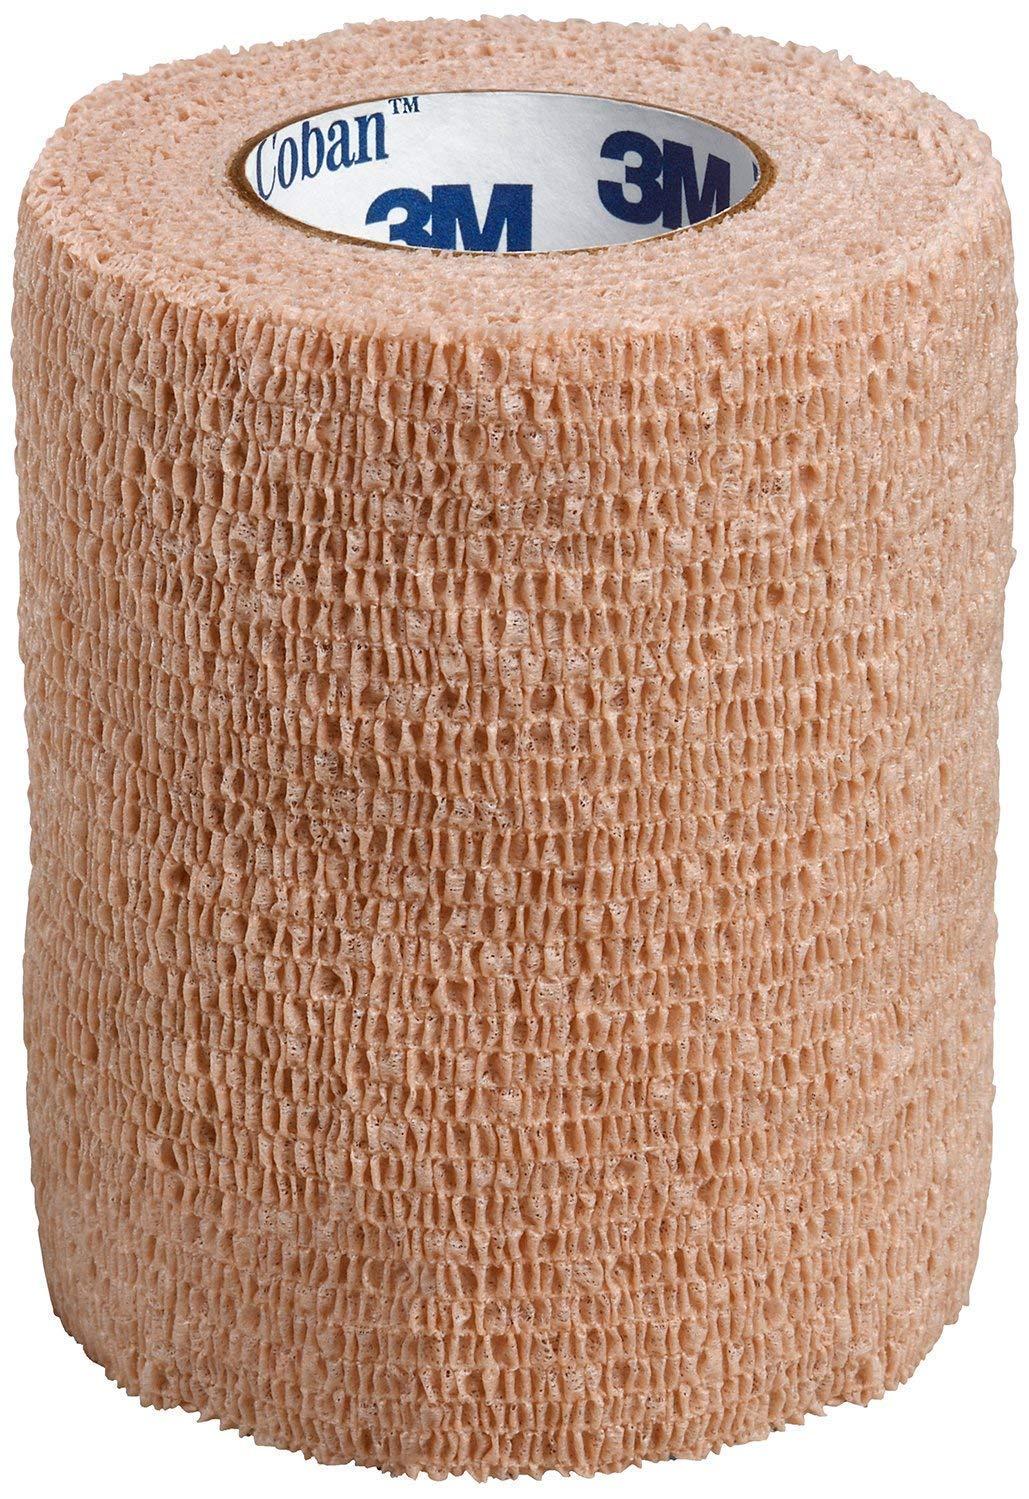 "3M Coban Self-Adherent Wrap, Tan, 3""x 5yds, Box of 24 Rolls"